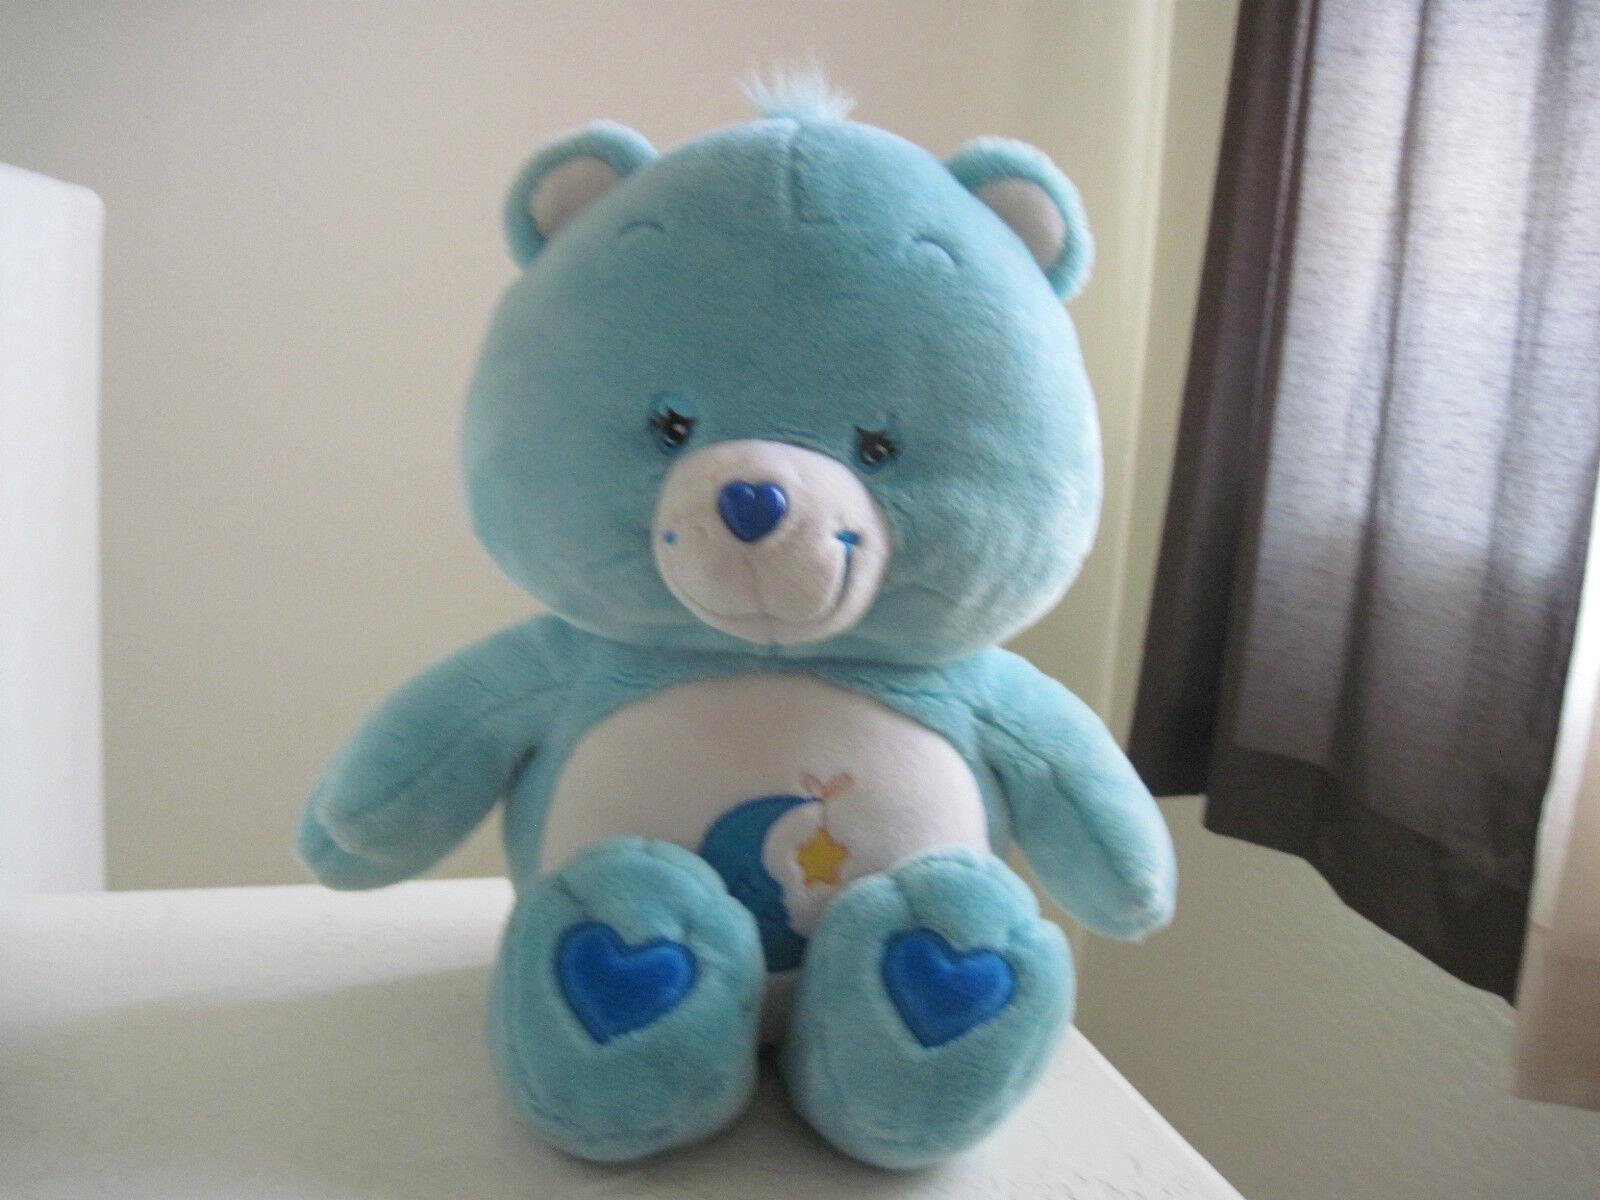 GIANT Big Jumbo Care Bears BEDTIME BEAR 26  Plush Stuffed Animal